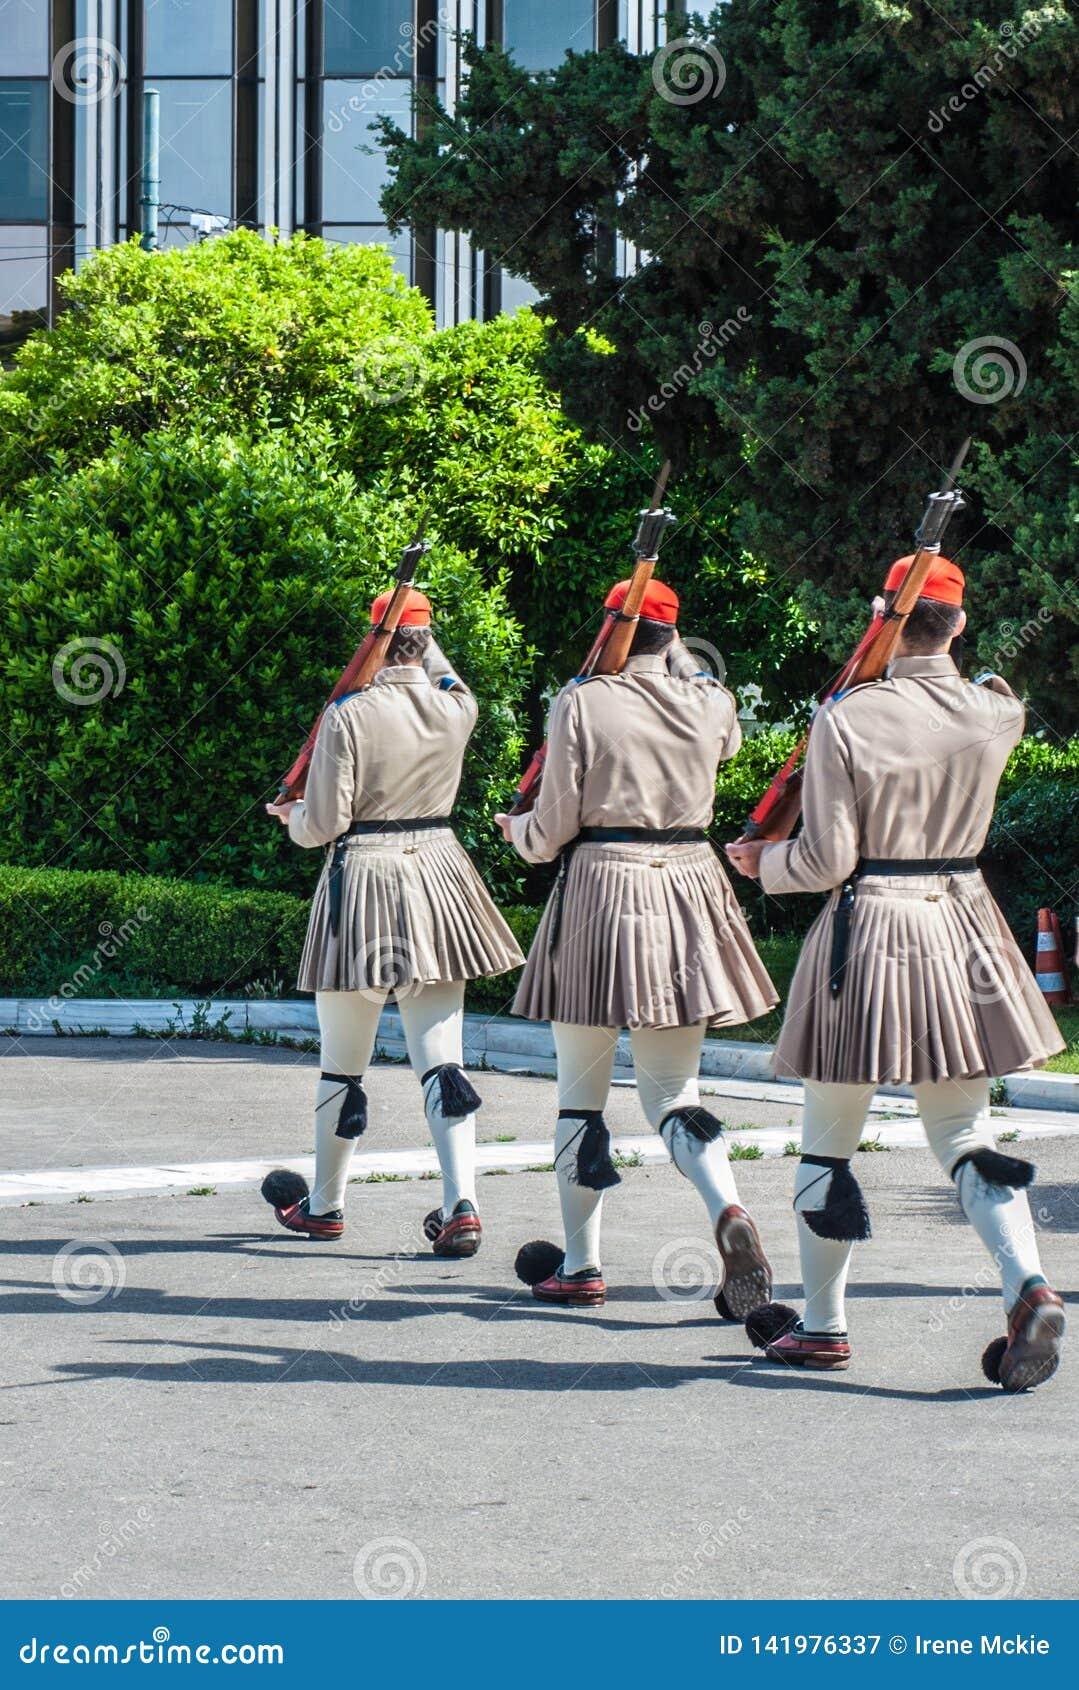 Grécia, Atenas, cerimonial, marcha das guardas presidenciais